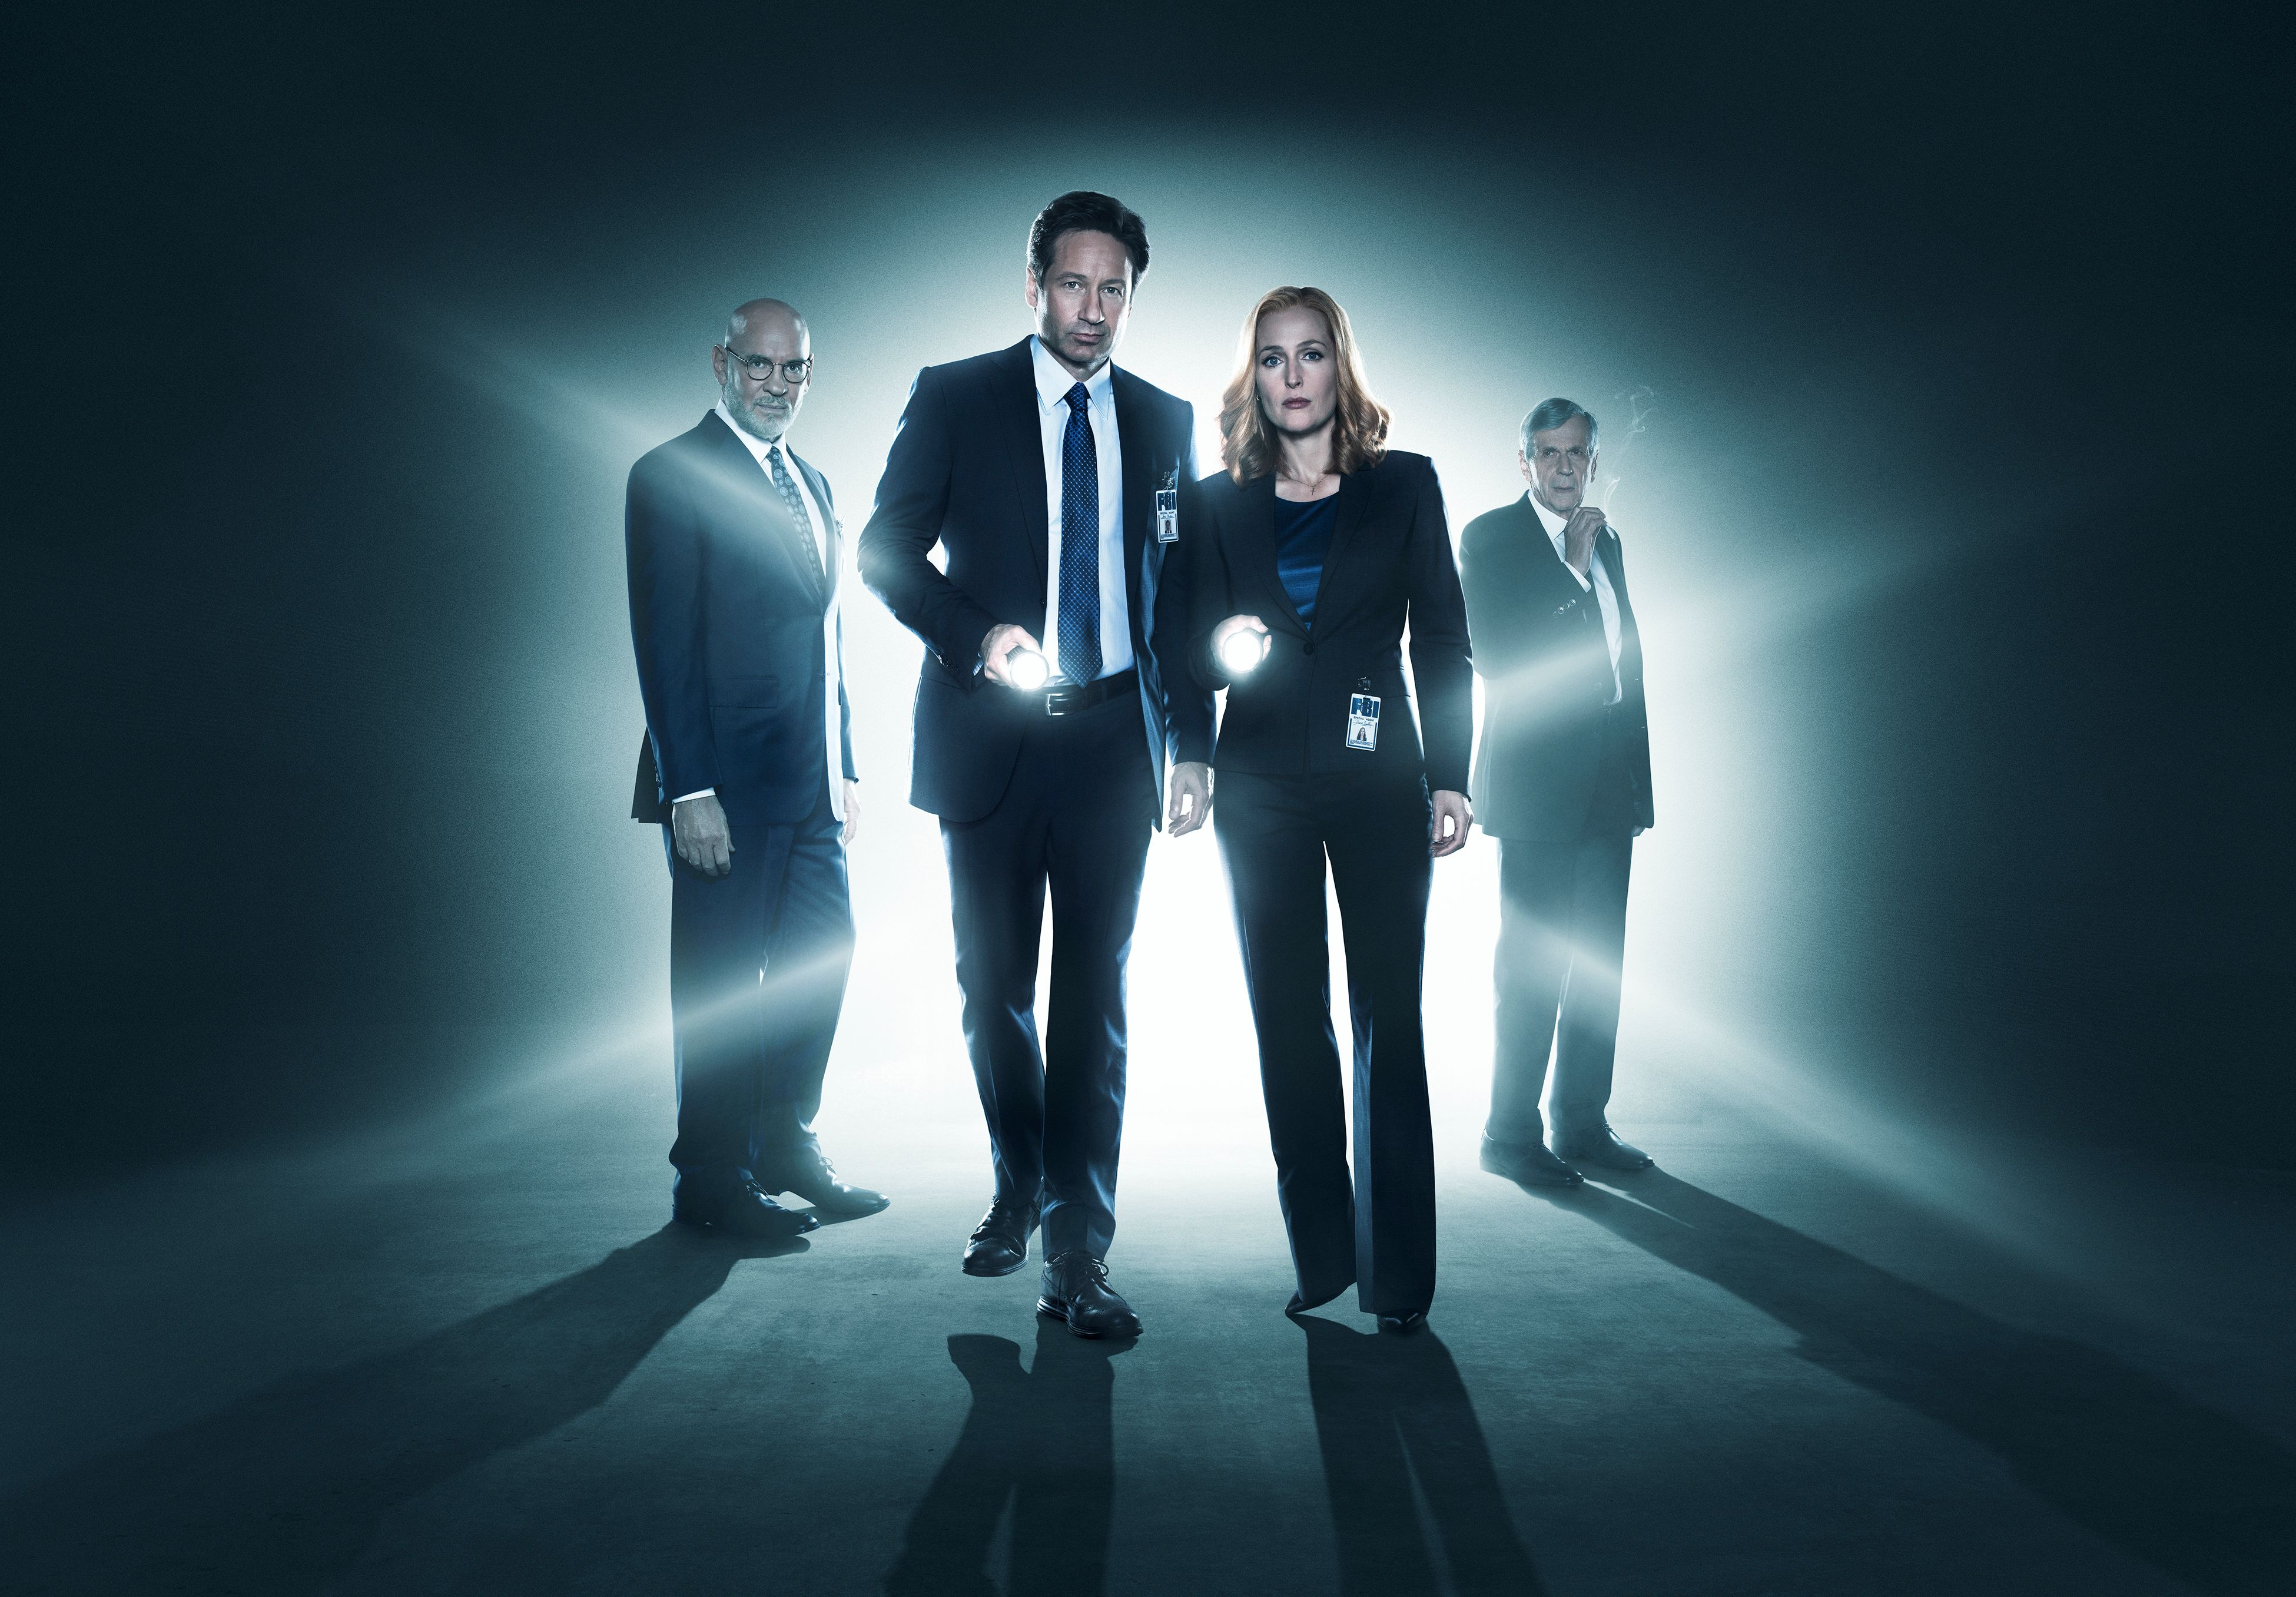 The X Files Revival Cast